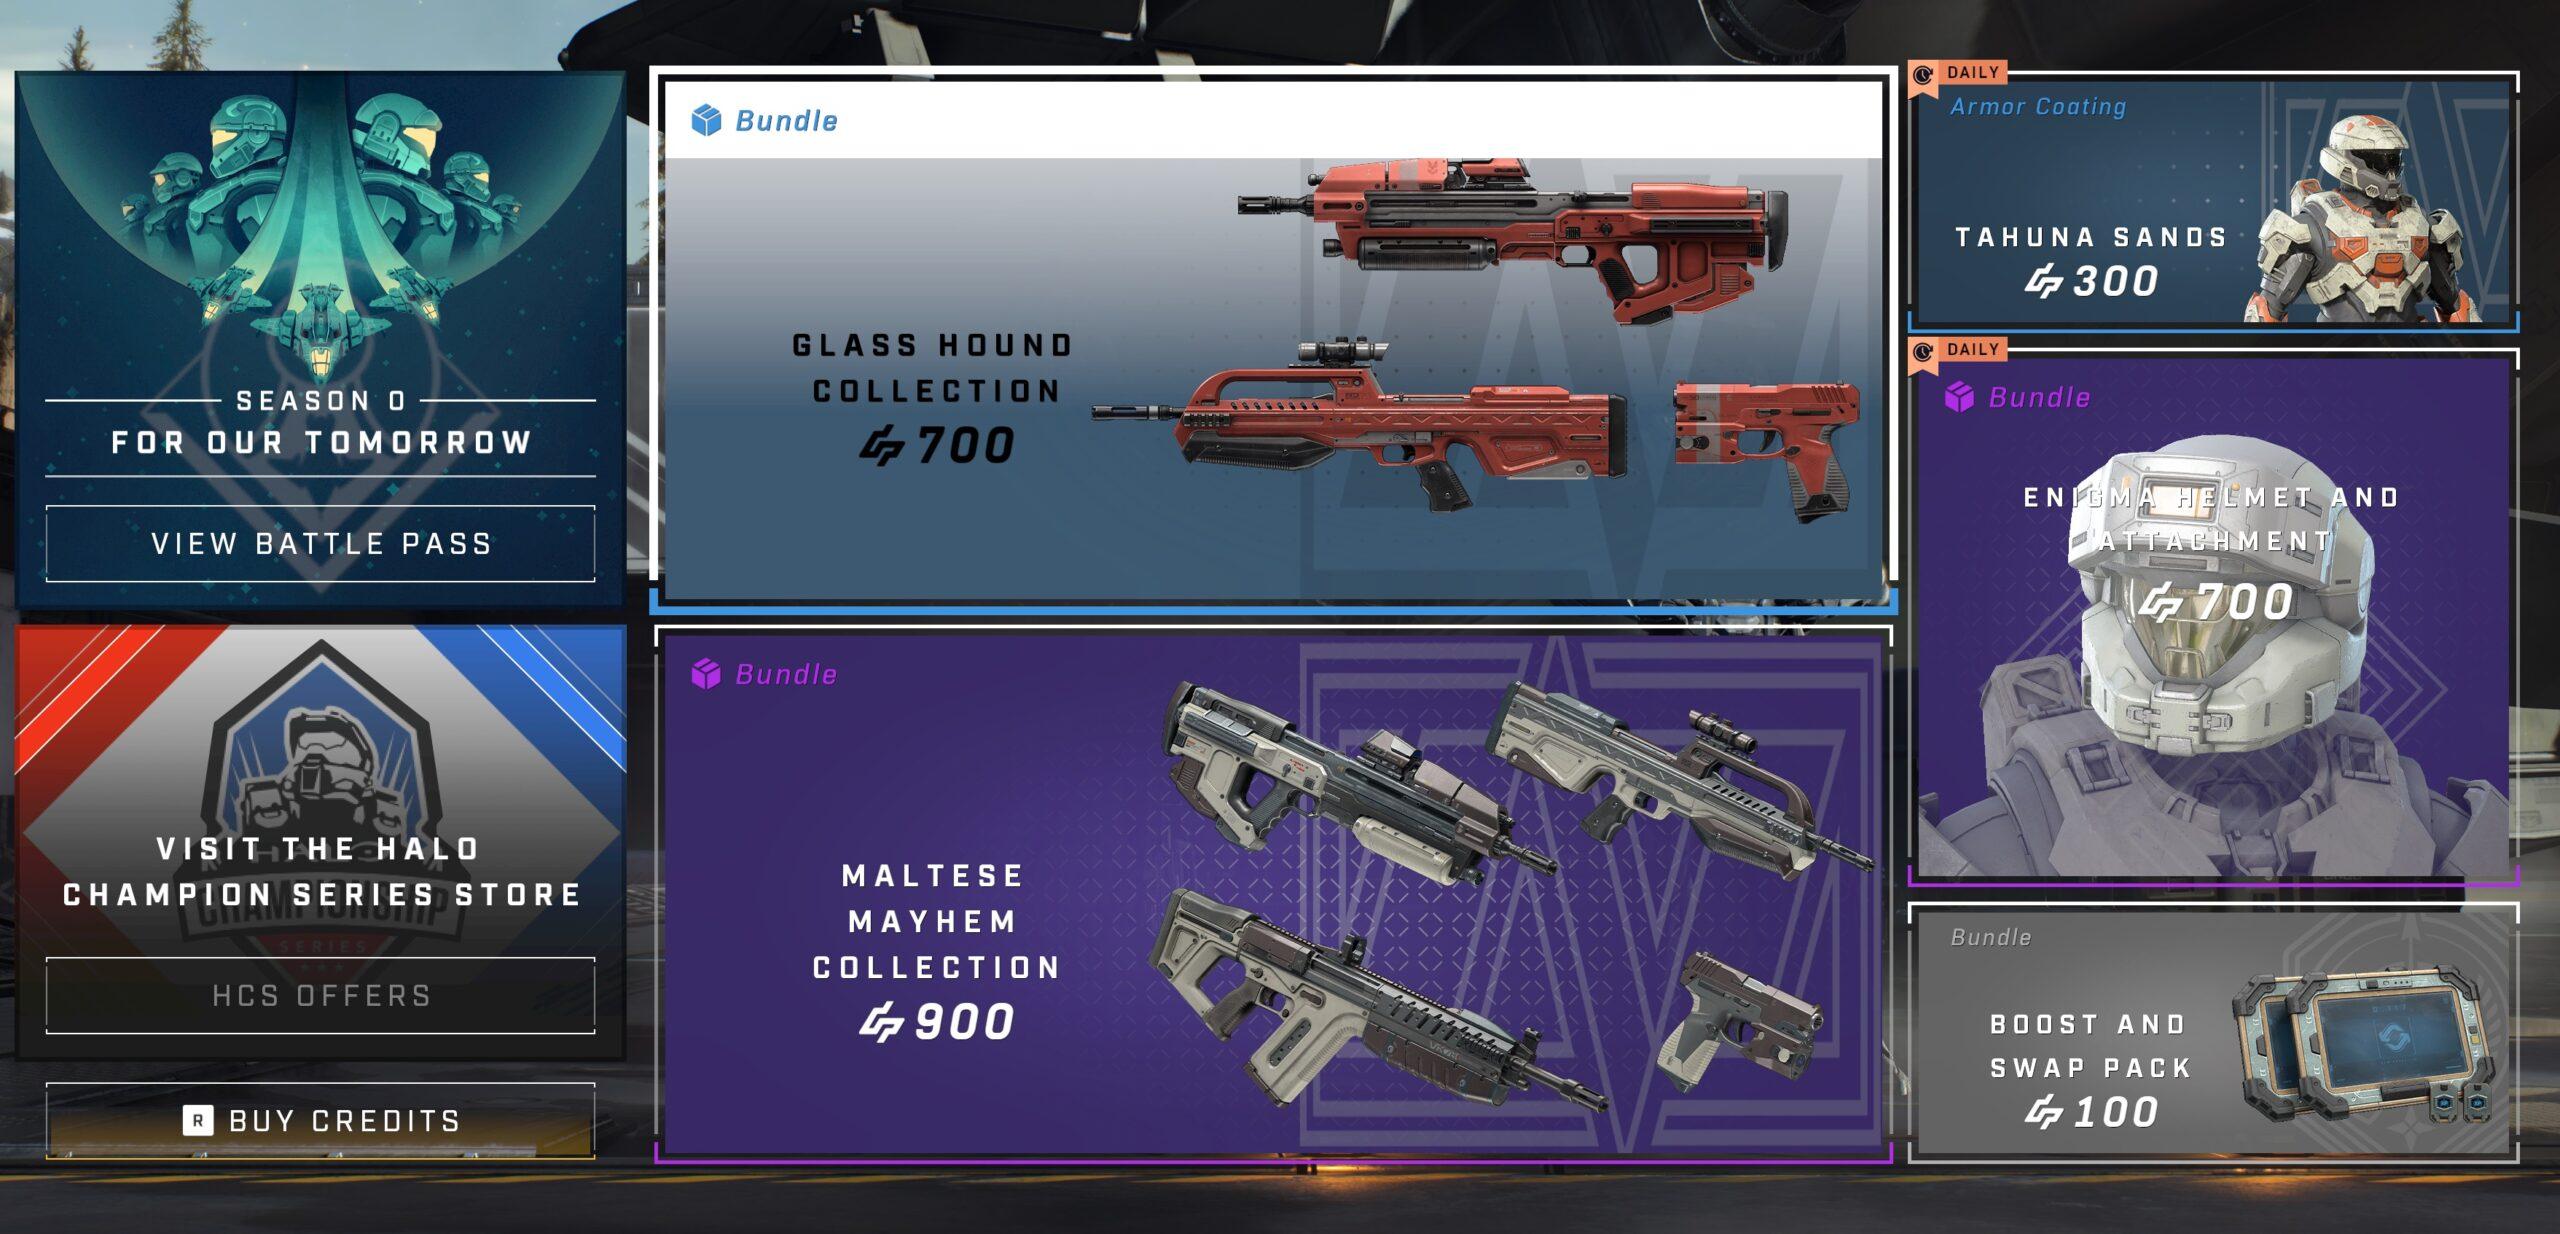 Halo Infinite preview 2